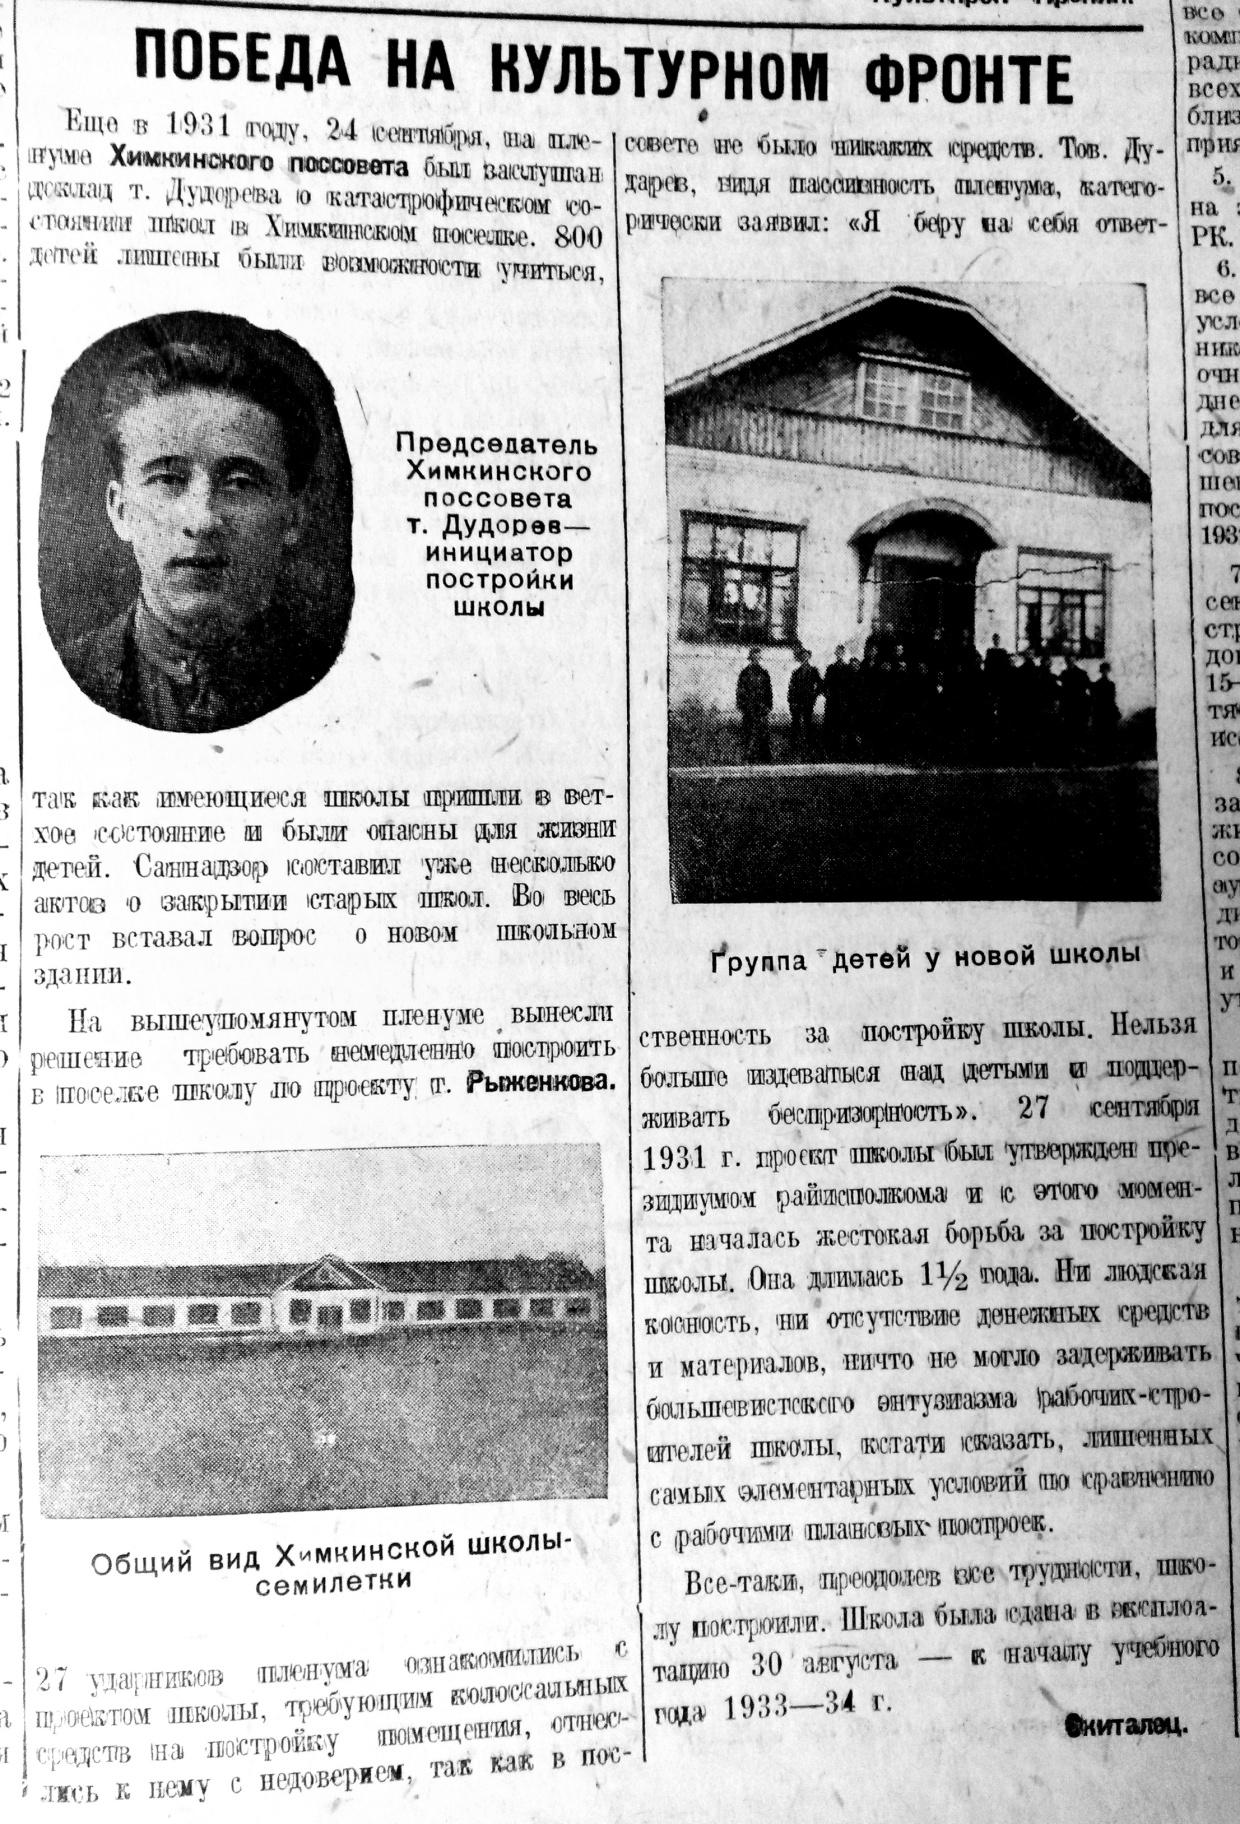 Рис. 6 1933г. №89 от 6 октября